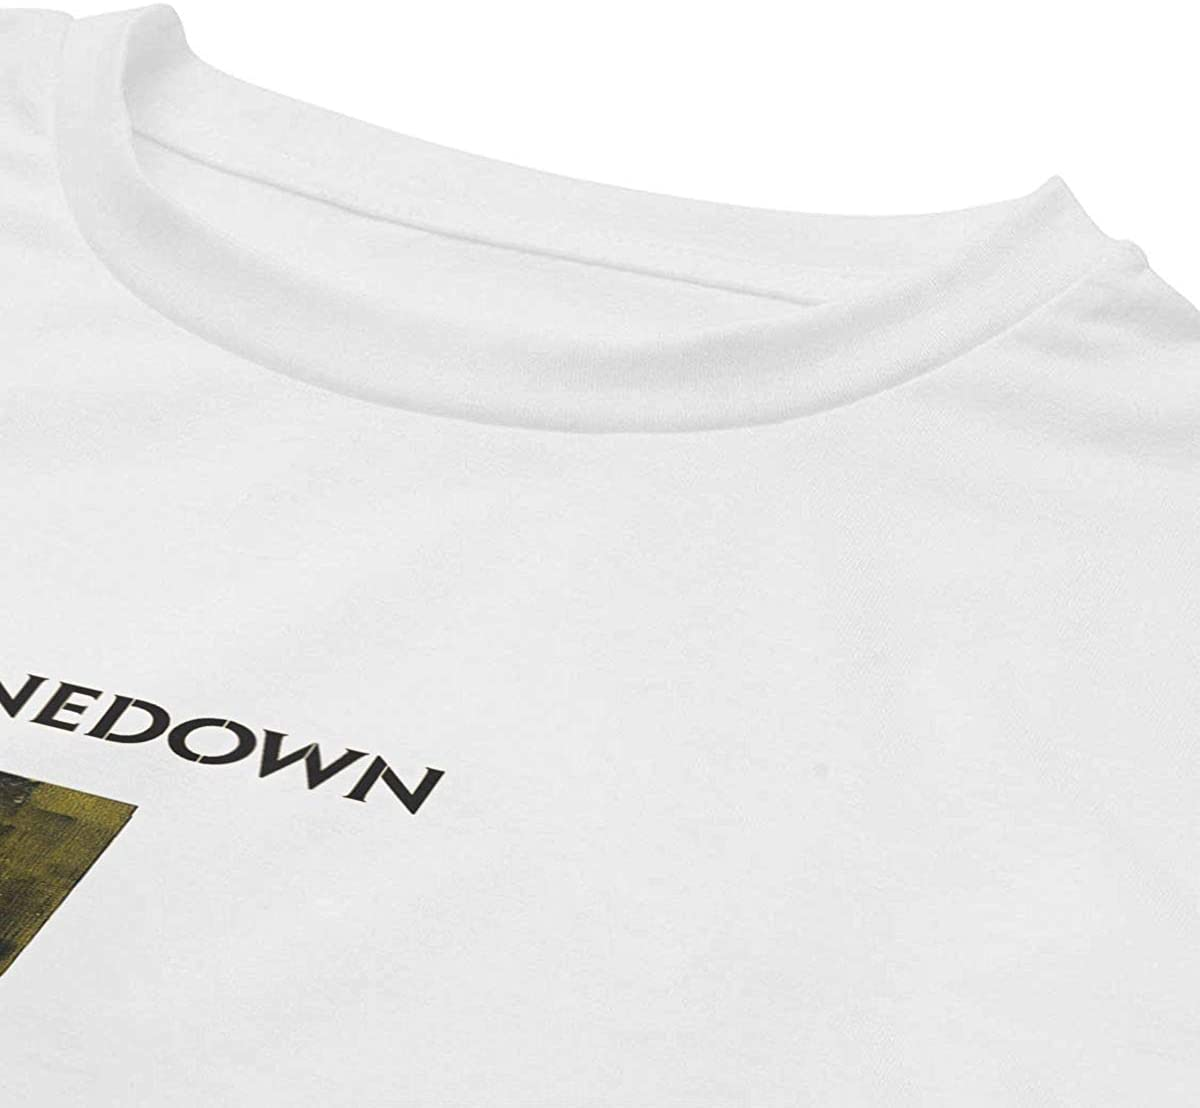 BobbyElliott Shinedown Womans Short Sleeve T-Shirt Casual Basic Soft Crop Top Tees White